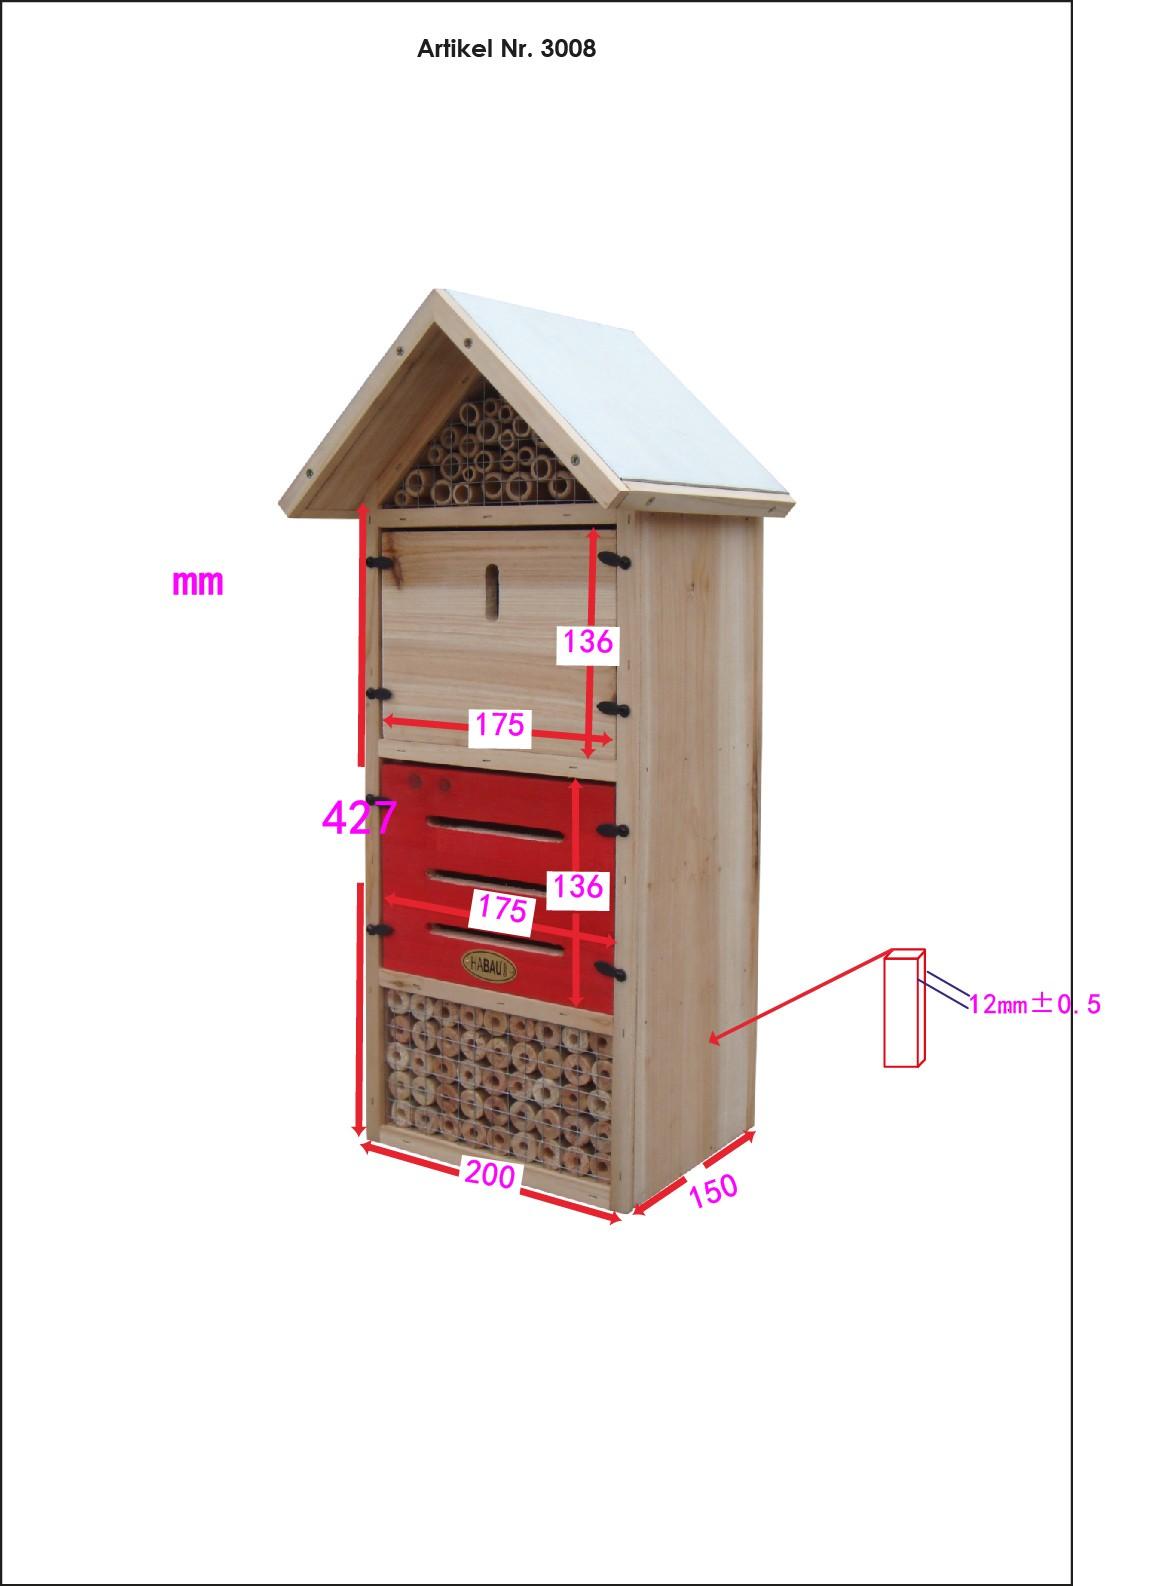 HABAU Insektenhotel Kompakt - Skizze mit Maßen - 3008